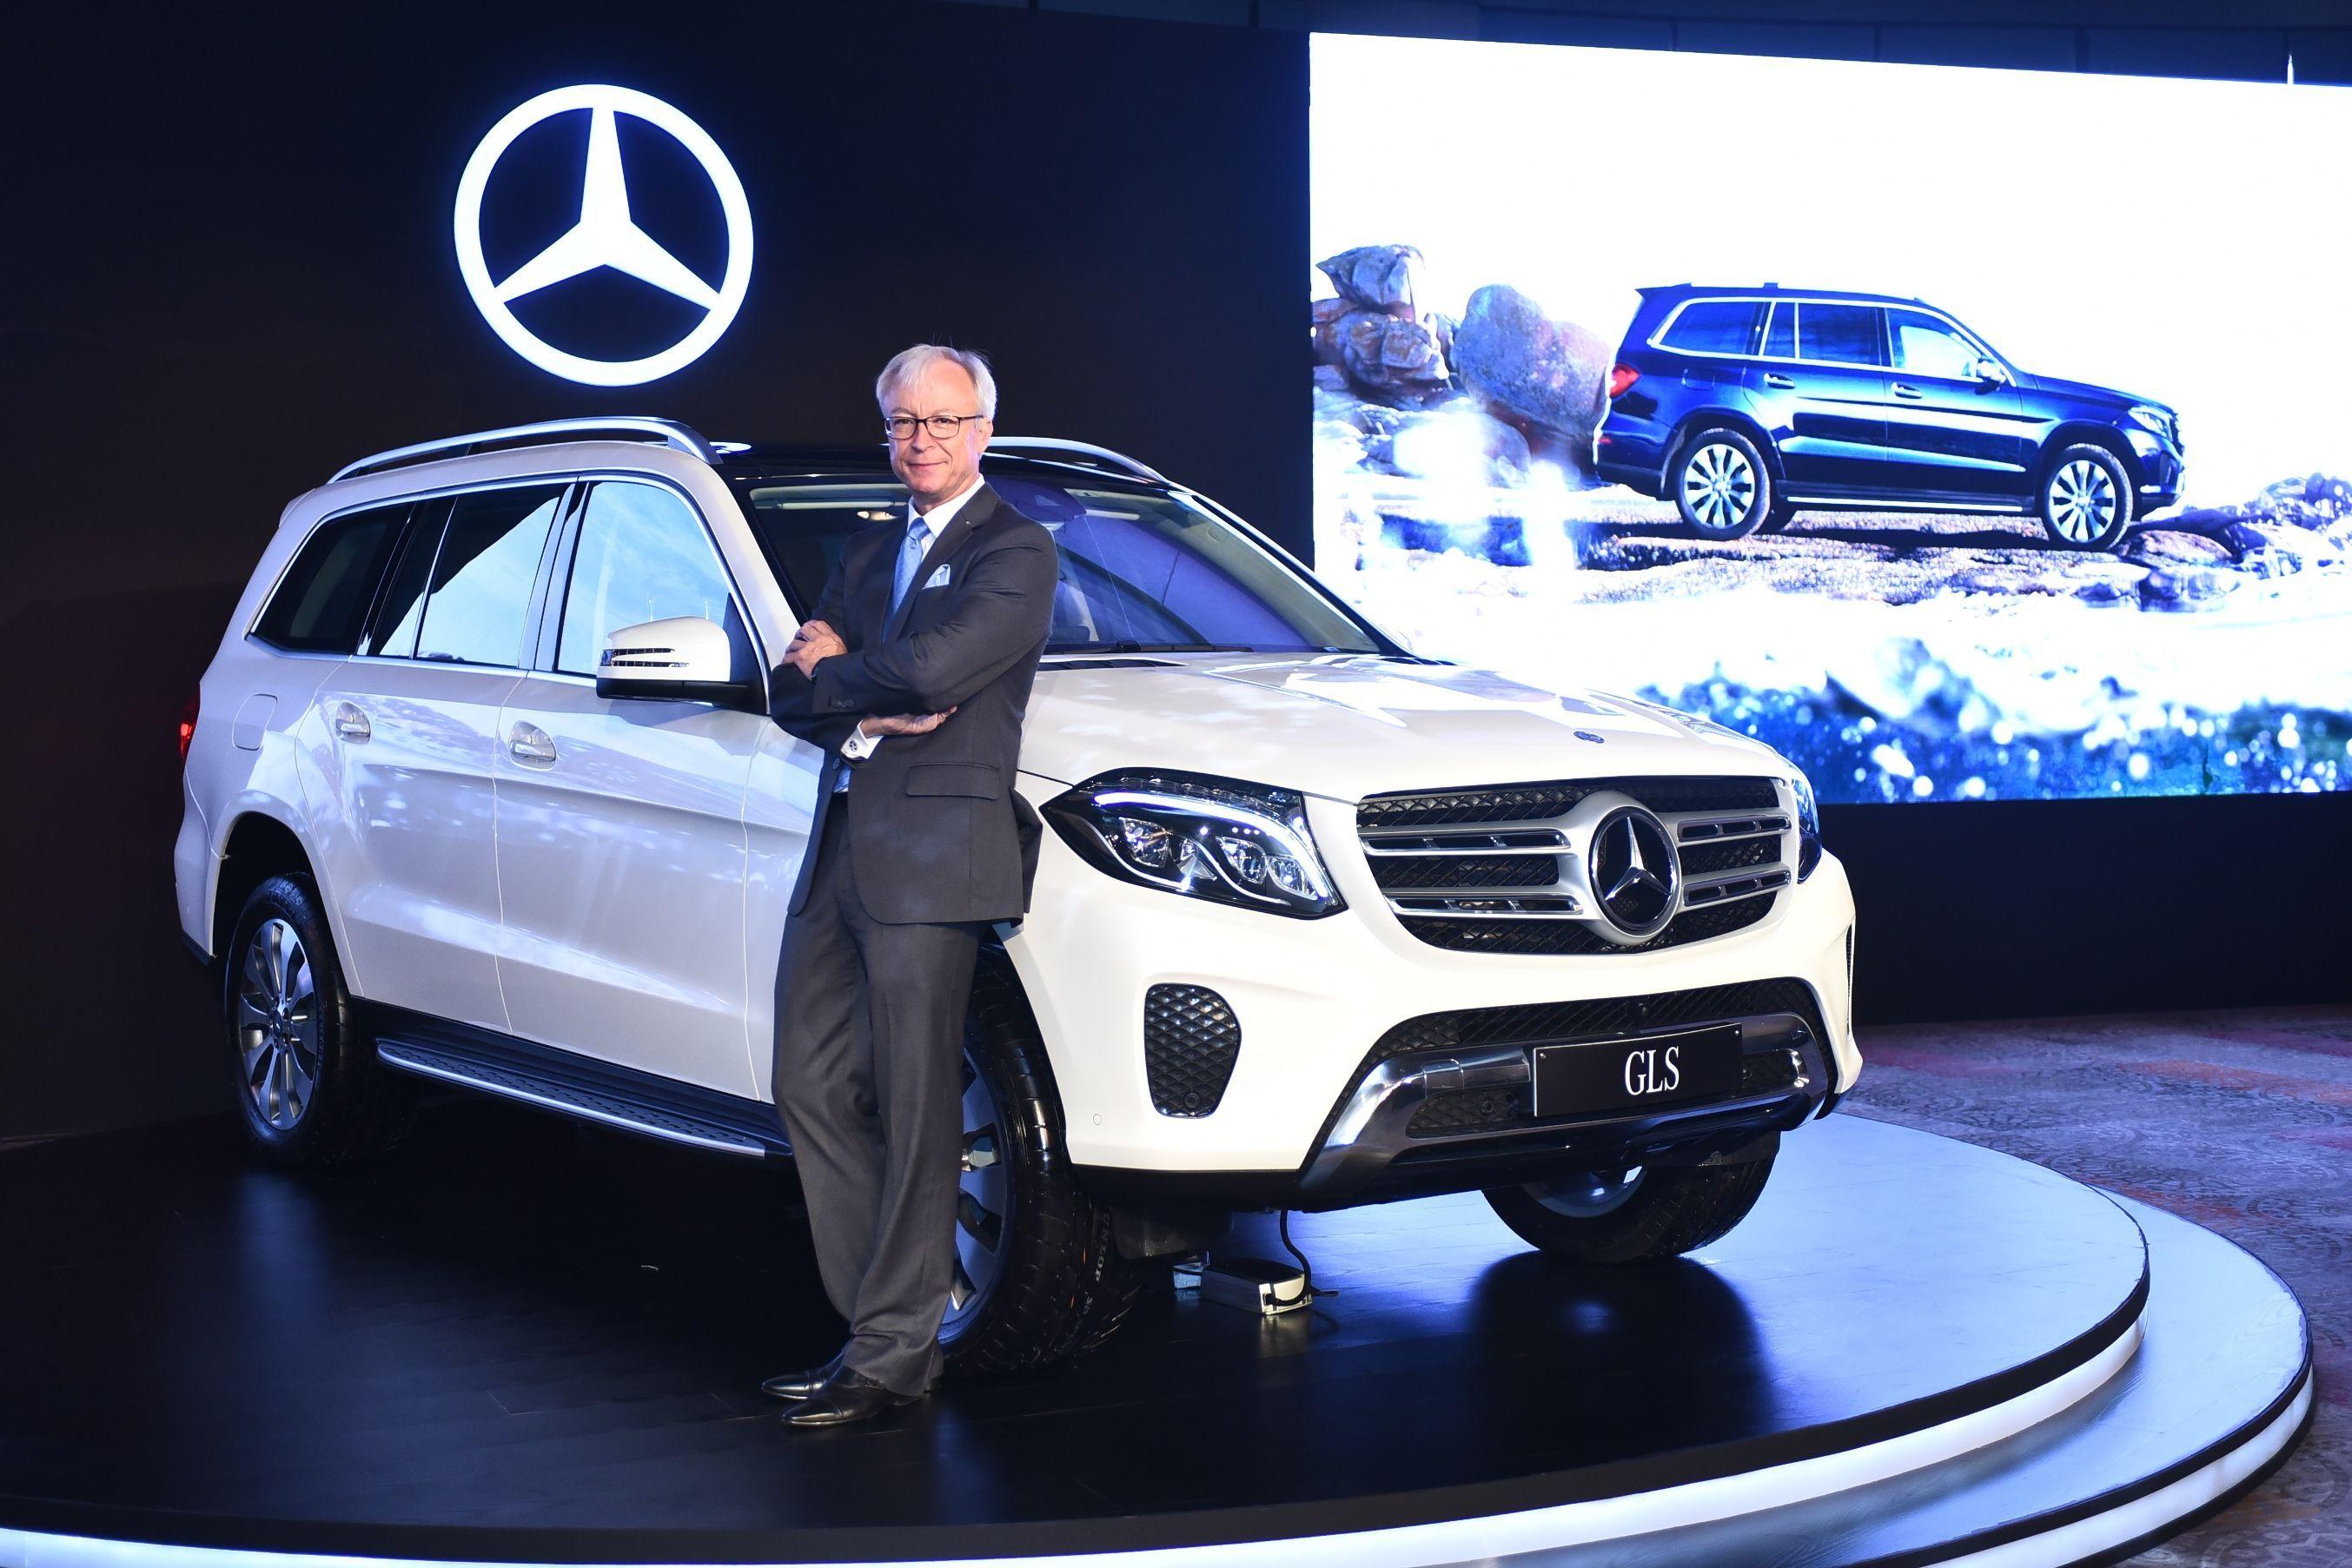 Mercedes-Benz GL-Class Price, Images, Mileage, Reviews, Specs